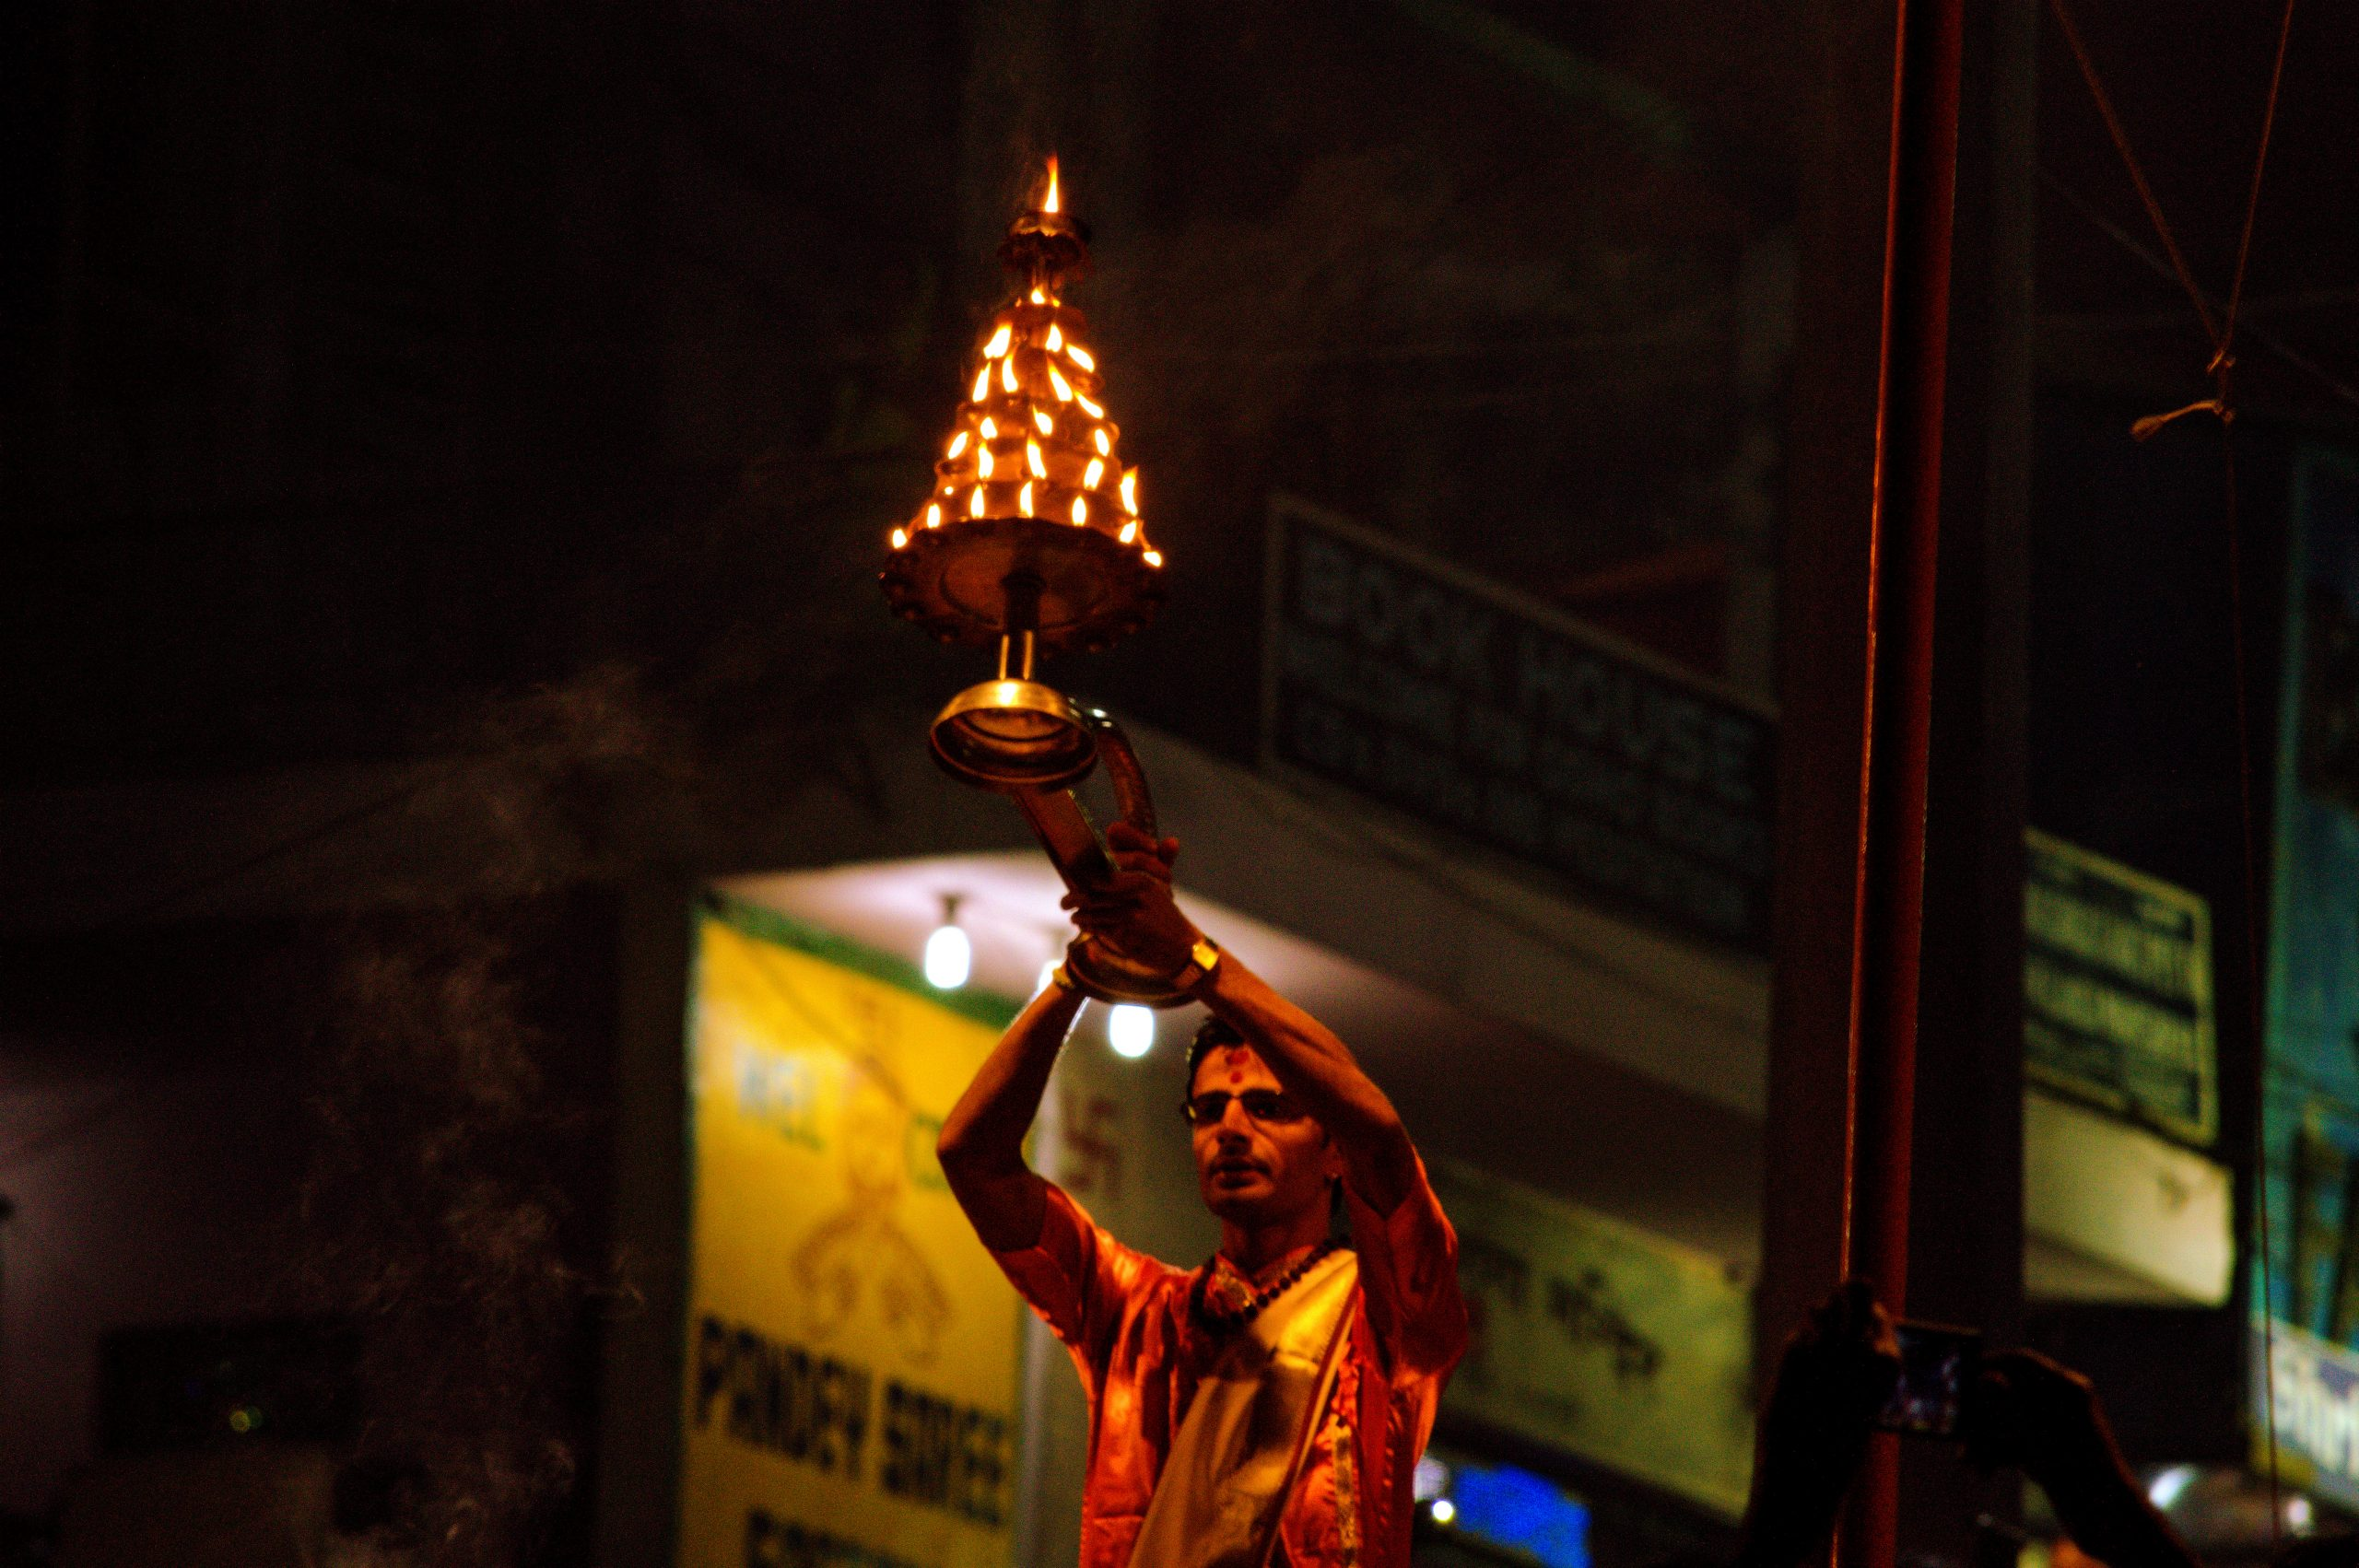 A boy during Ganga worship in Varanasi